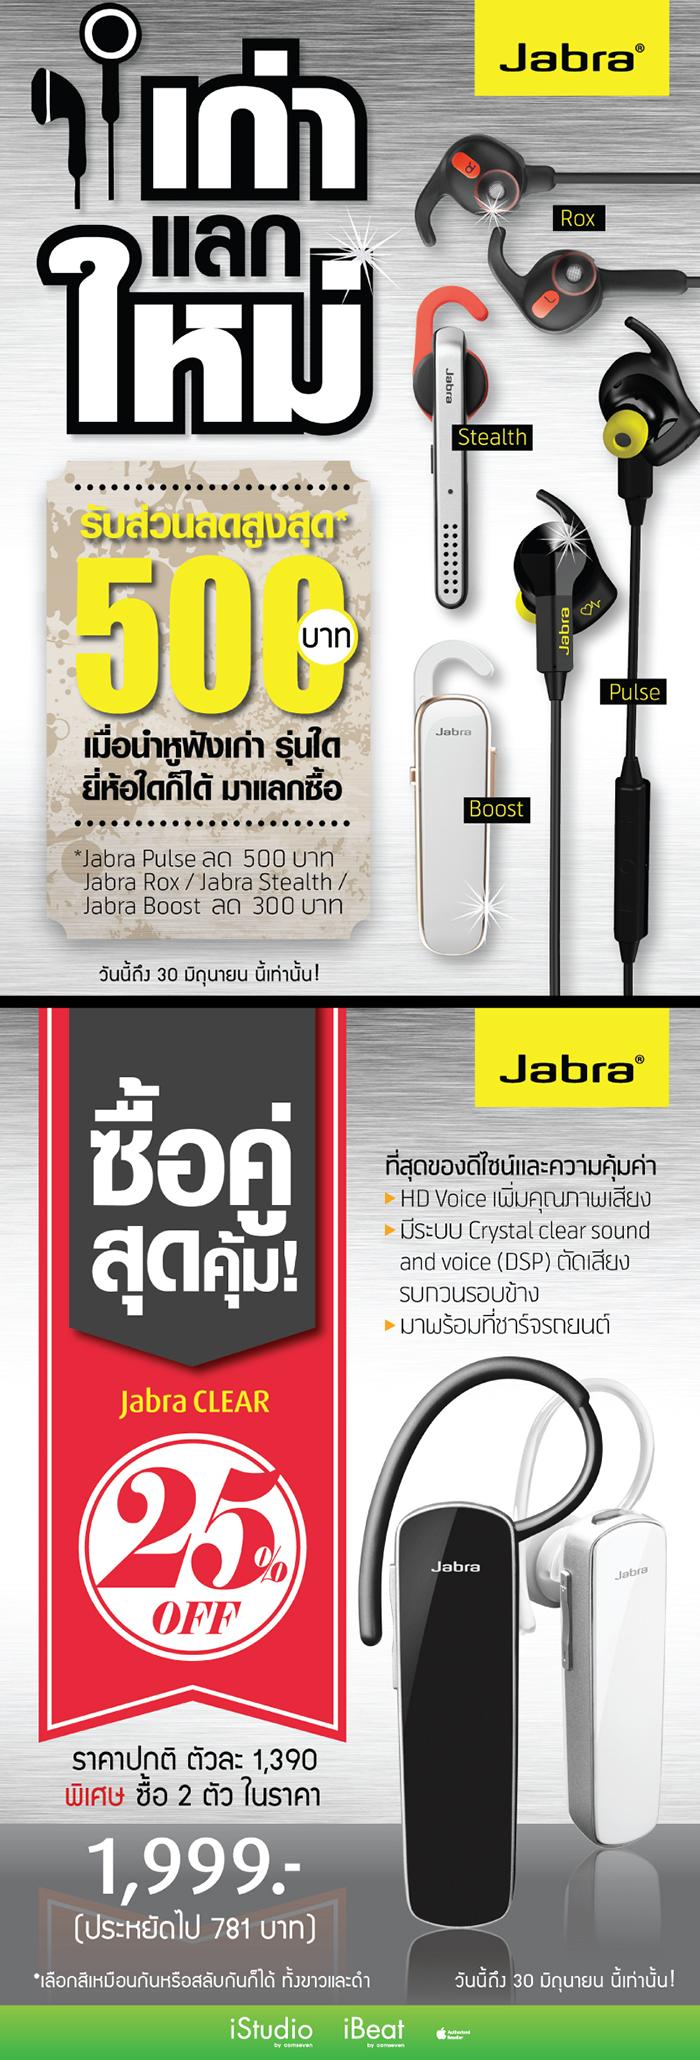 Jabra_Web_iStudio